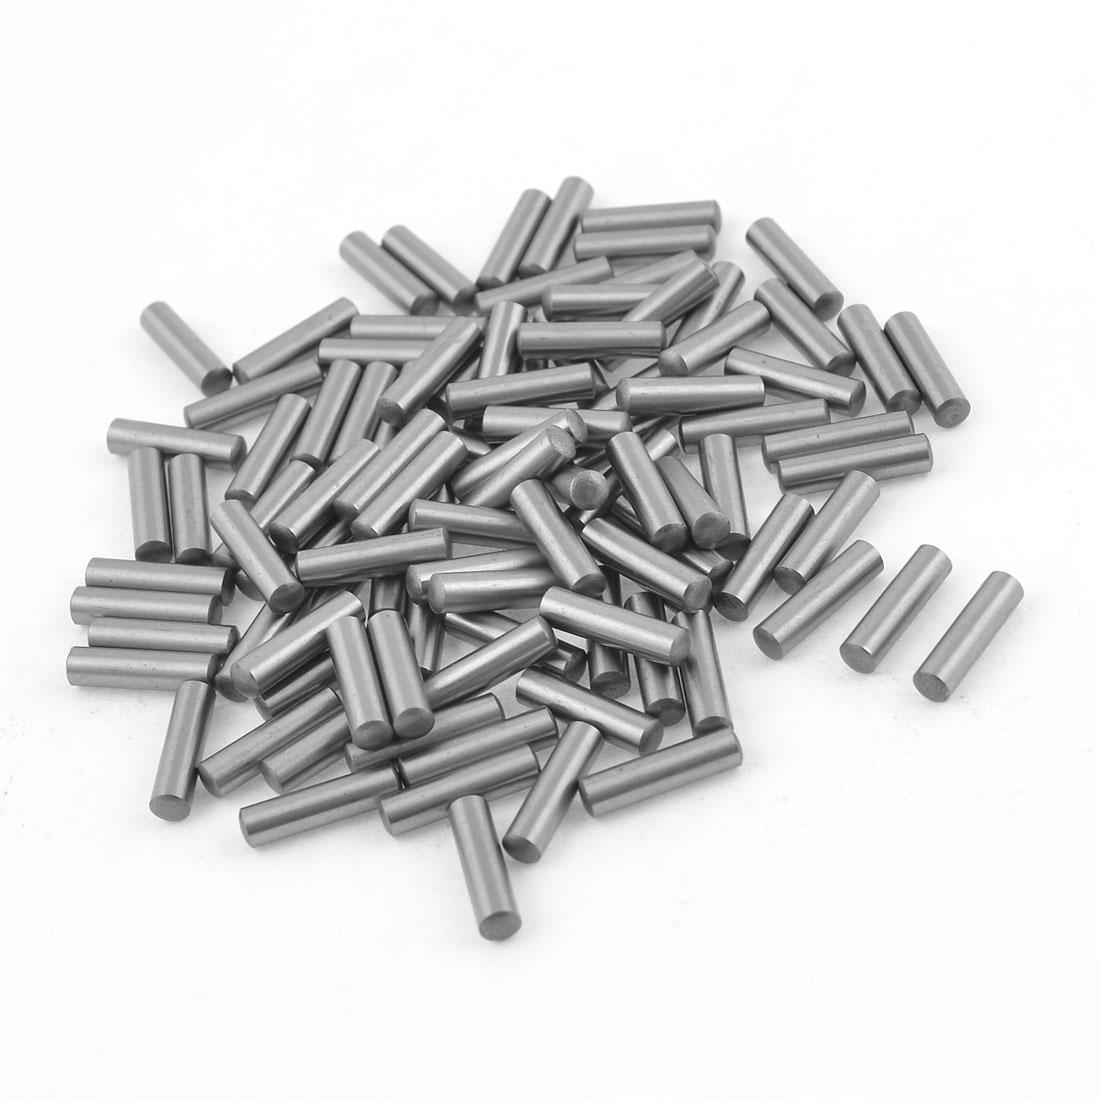 100 Pcs 3.3mm Diameter 15.8mm Length Cylinder Parallel Dowel Pins